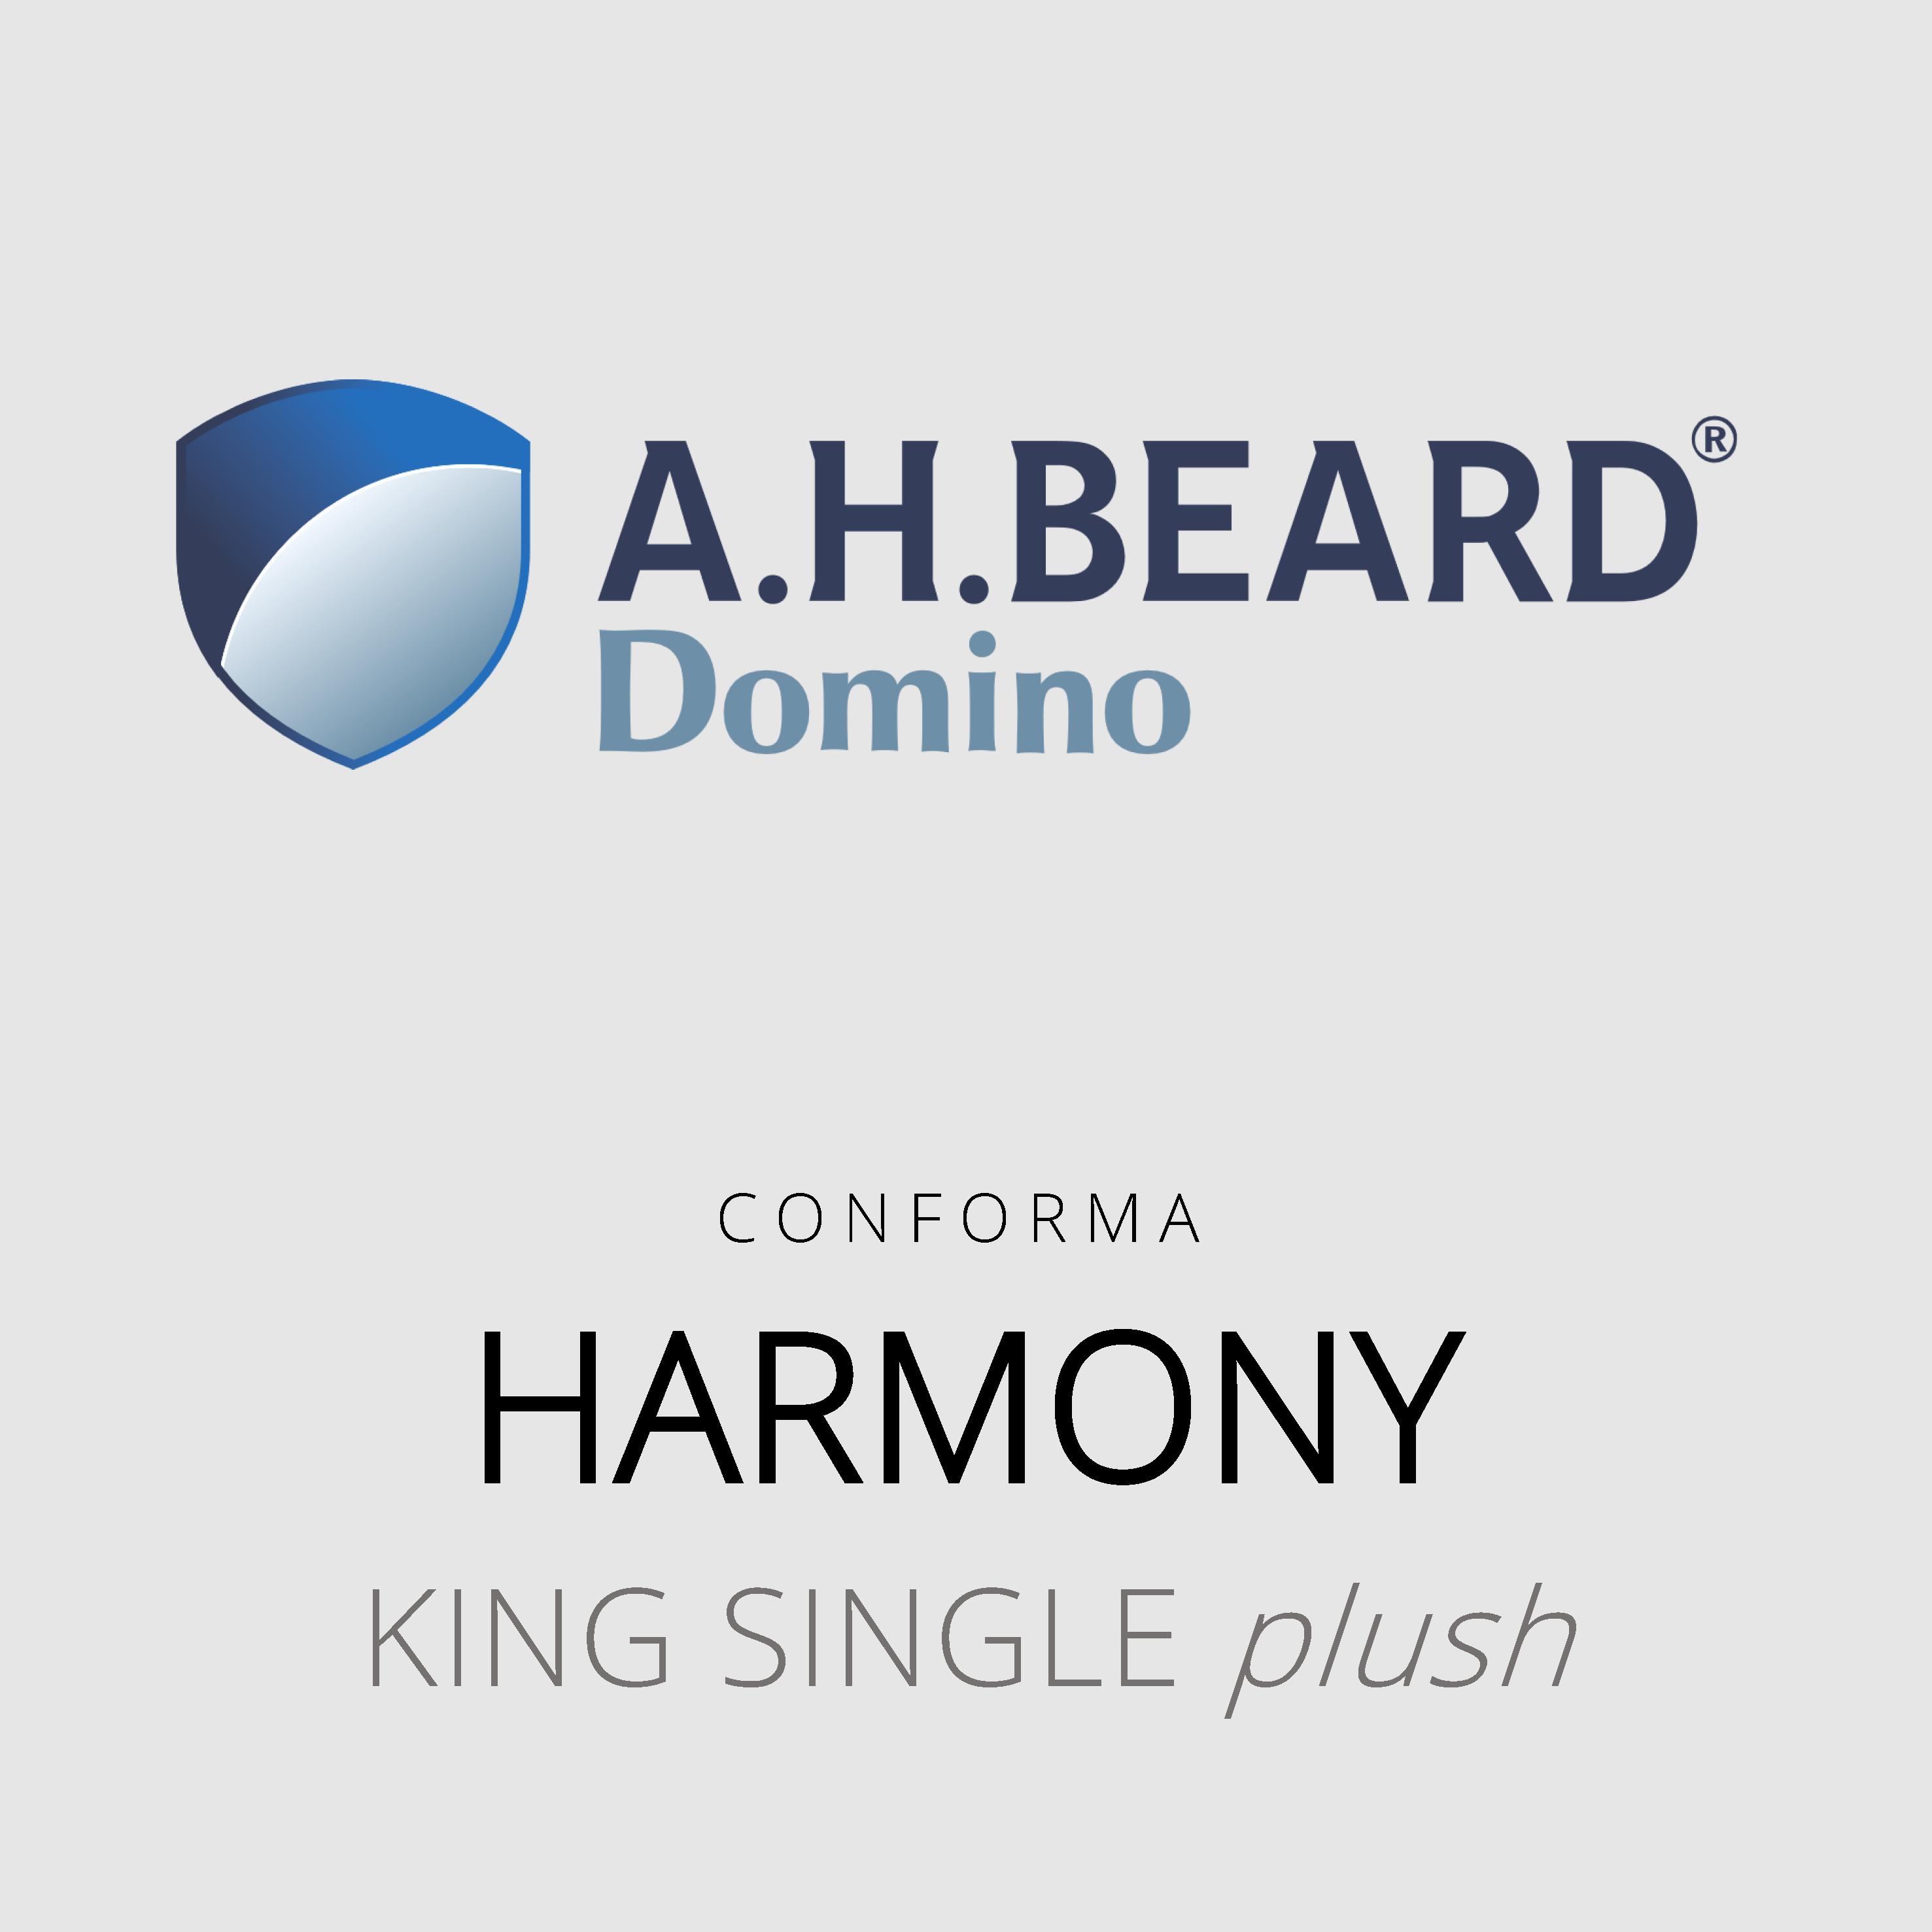 AH Beard Domino – Harmony – Conforma – King Single Plush Mattress